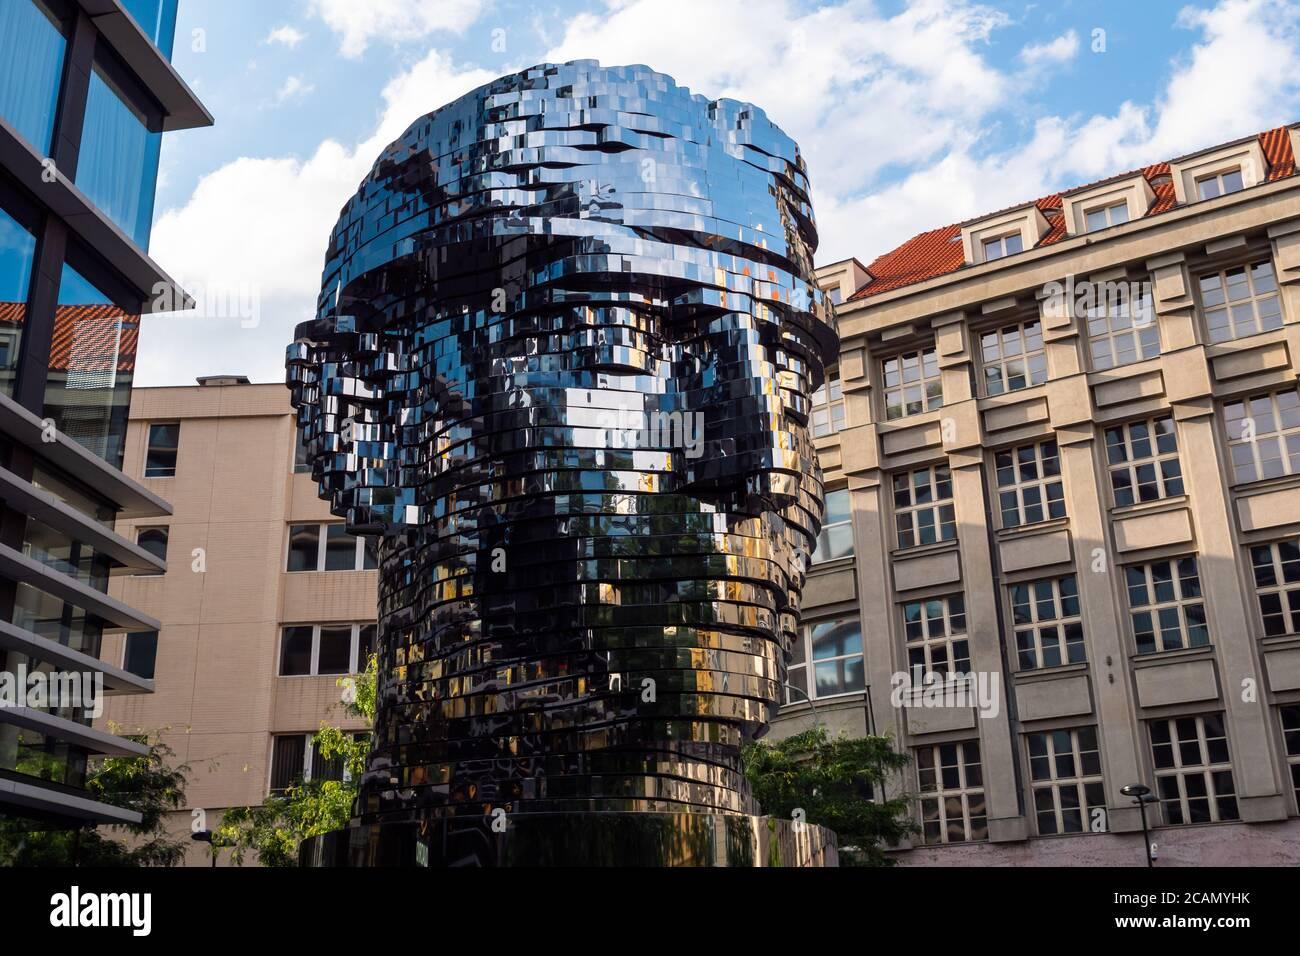 Praga, Repubblica Ceca - Luglio 11 2020: Turning Head of Franz Kafka in Czech Hlava Franze Kafky statue di Davd Cerny Foto Stock